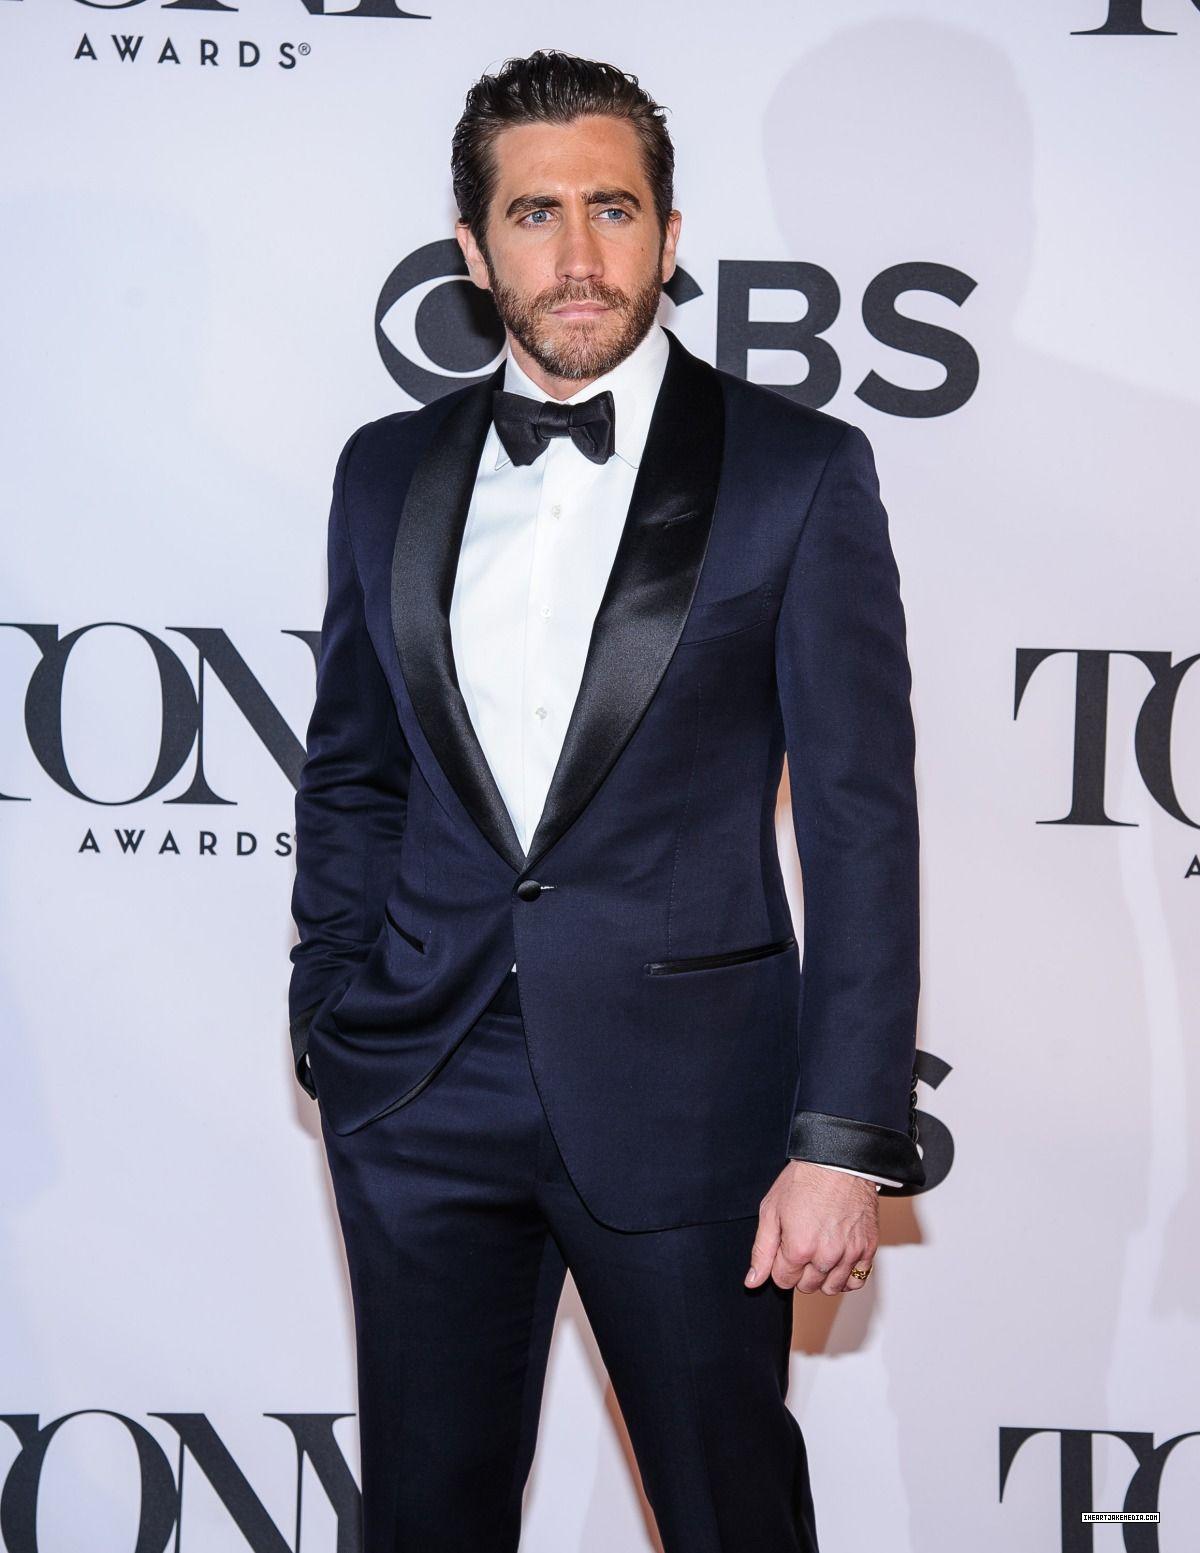 Midnight Blue Tuxedo Tom Ford. In James Bond Skyfall Men Suits